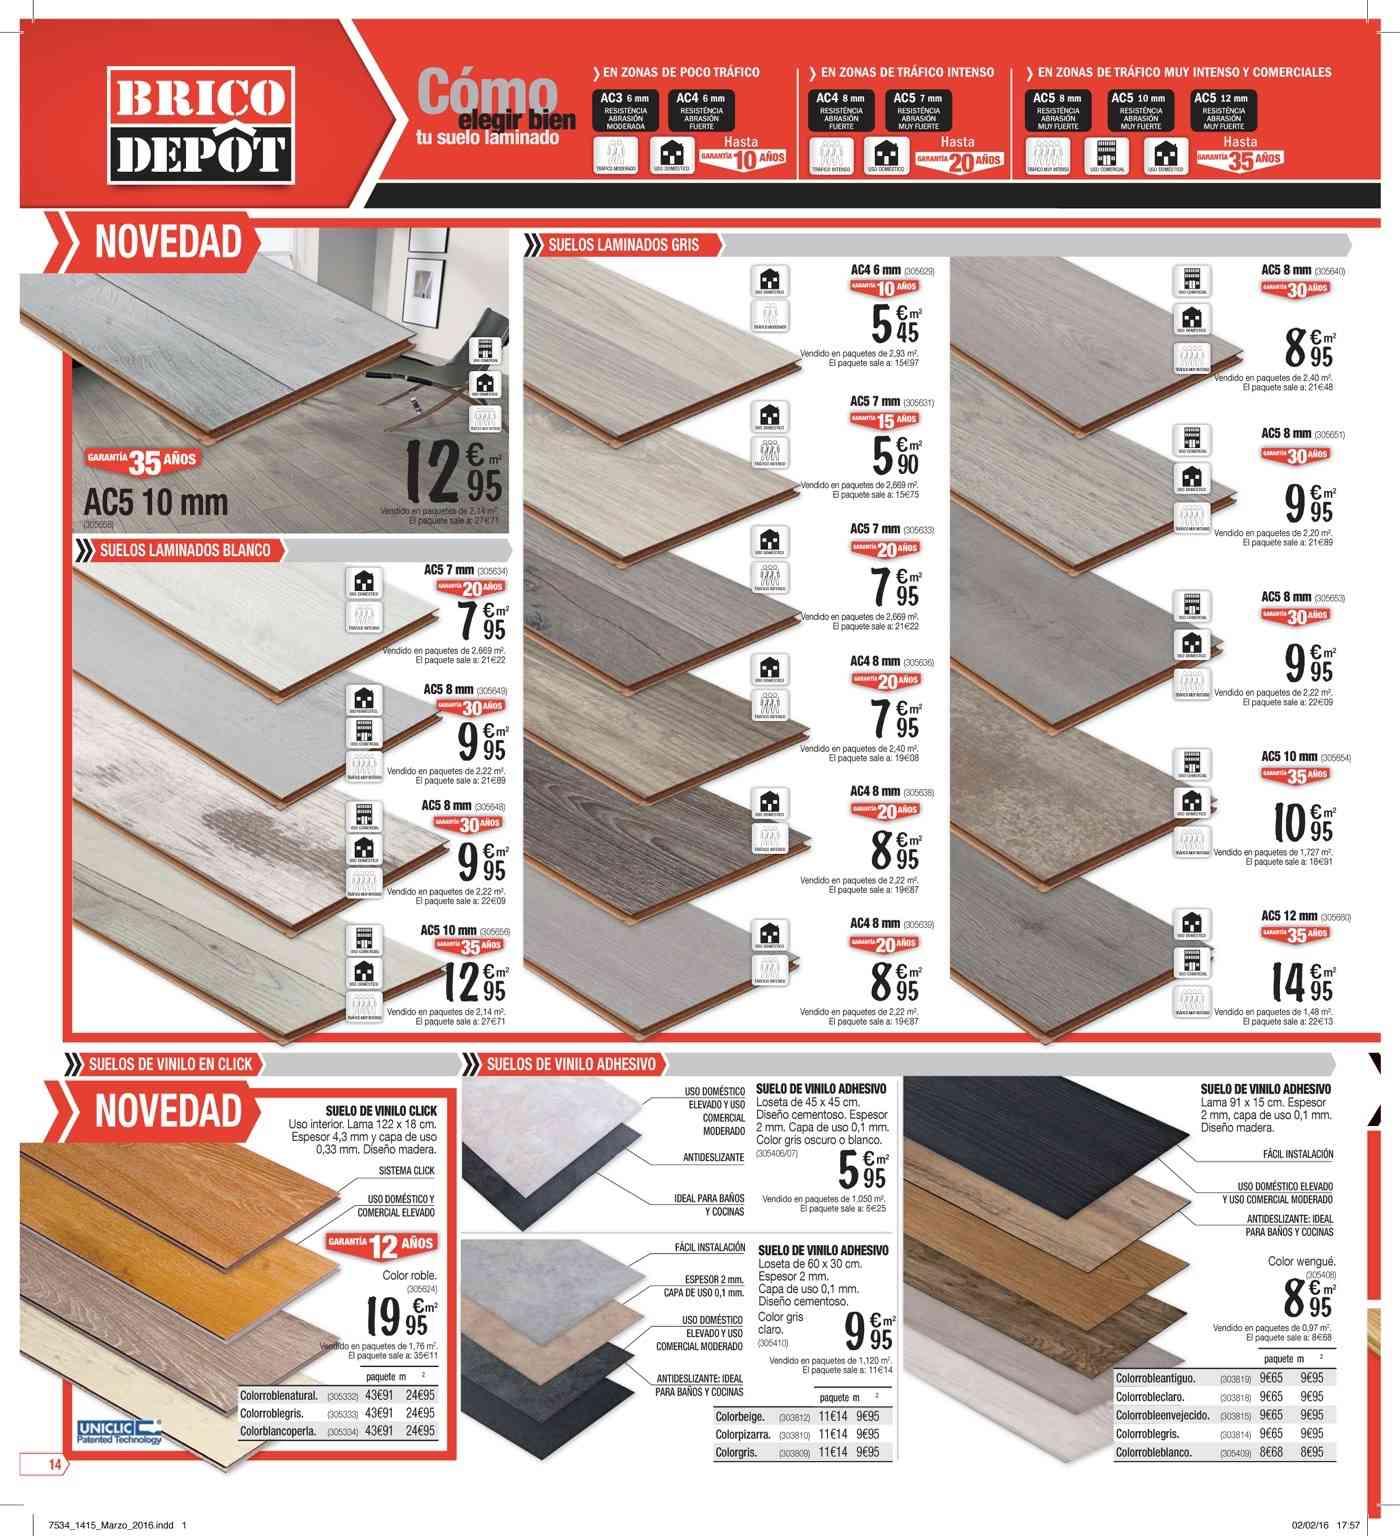 bricodepot catalogo marzo 2016 ofertas _Page_14